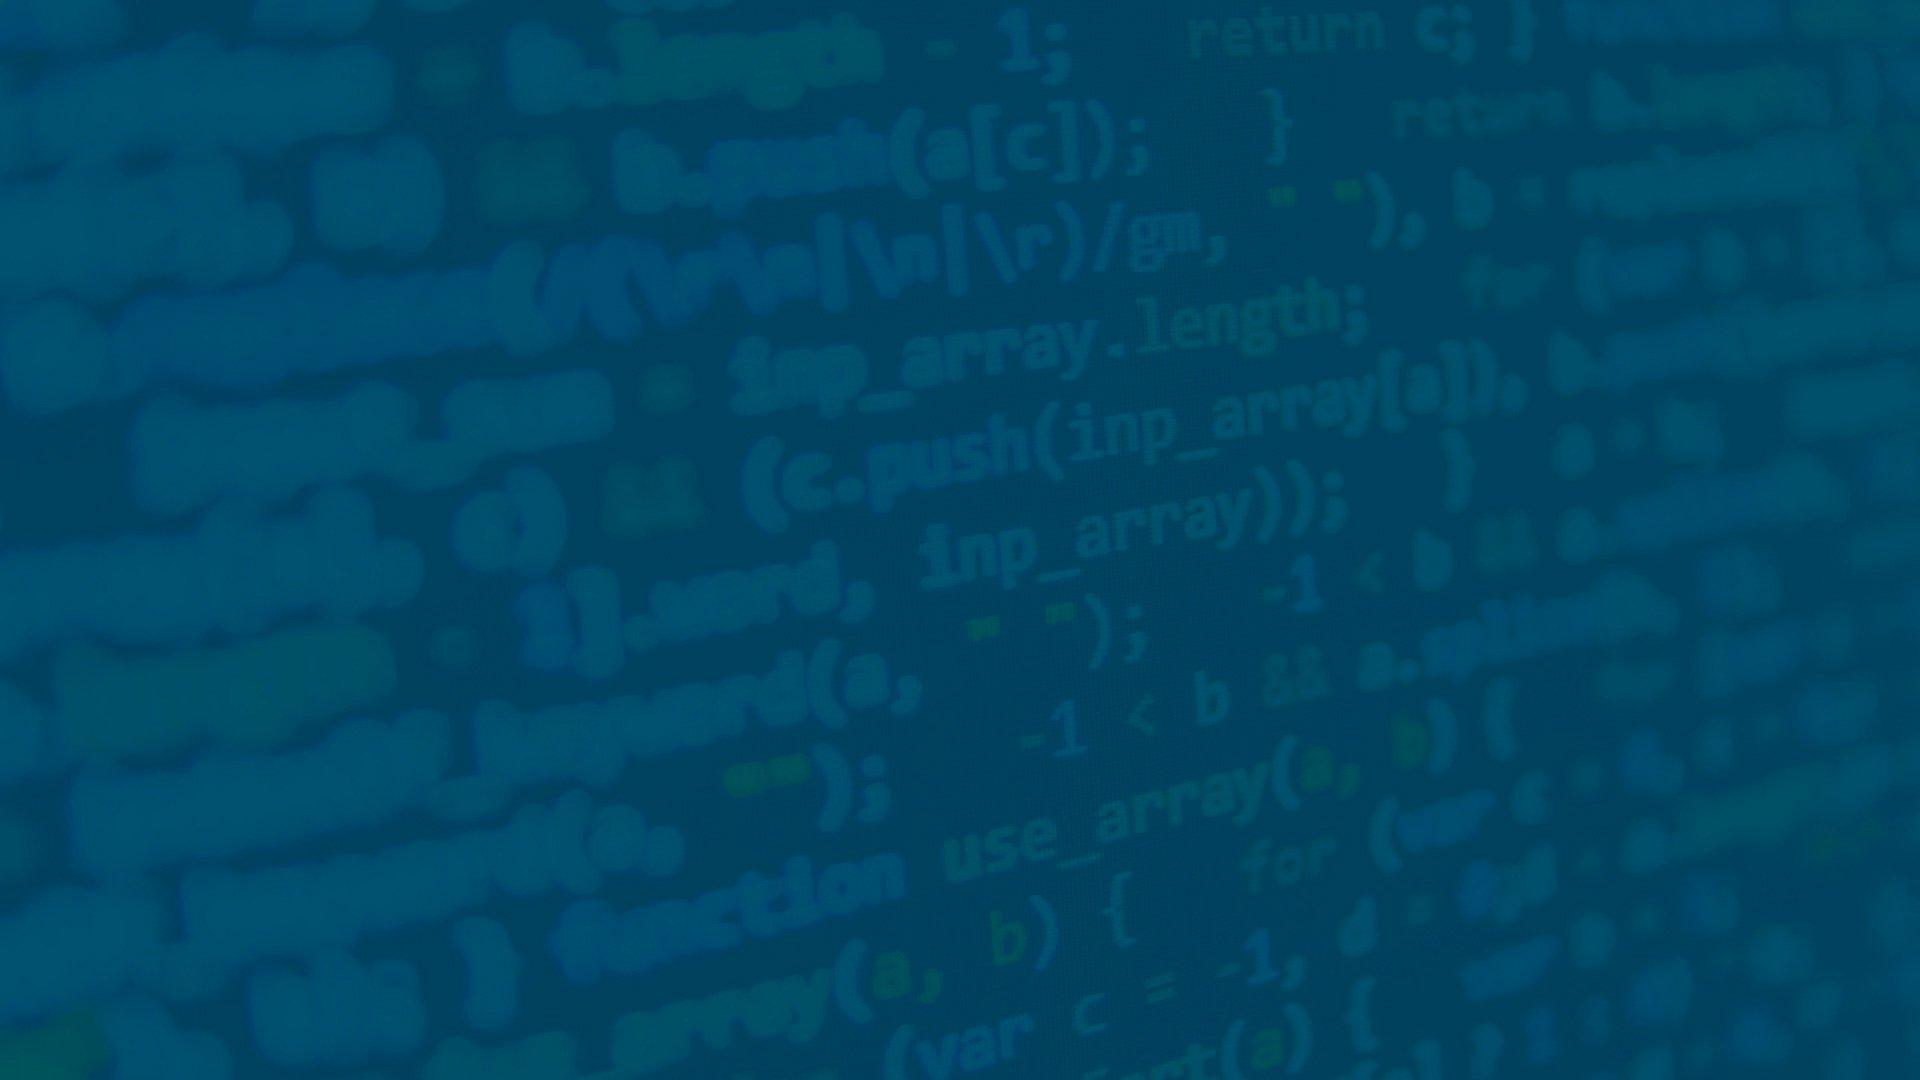 Start Your Web Development Journey with Direct Line Development